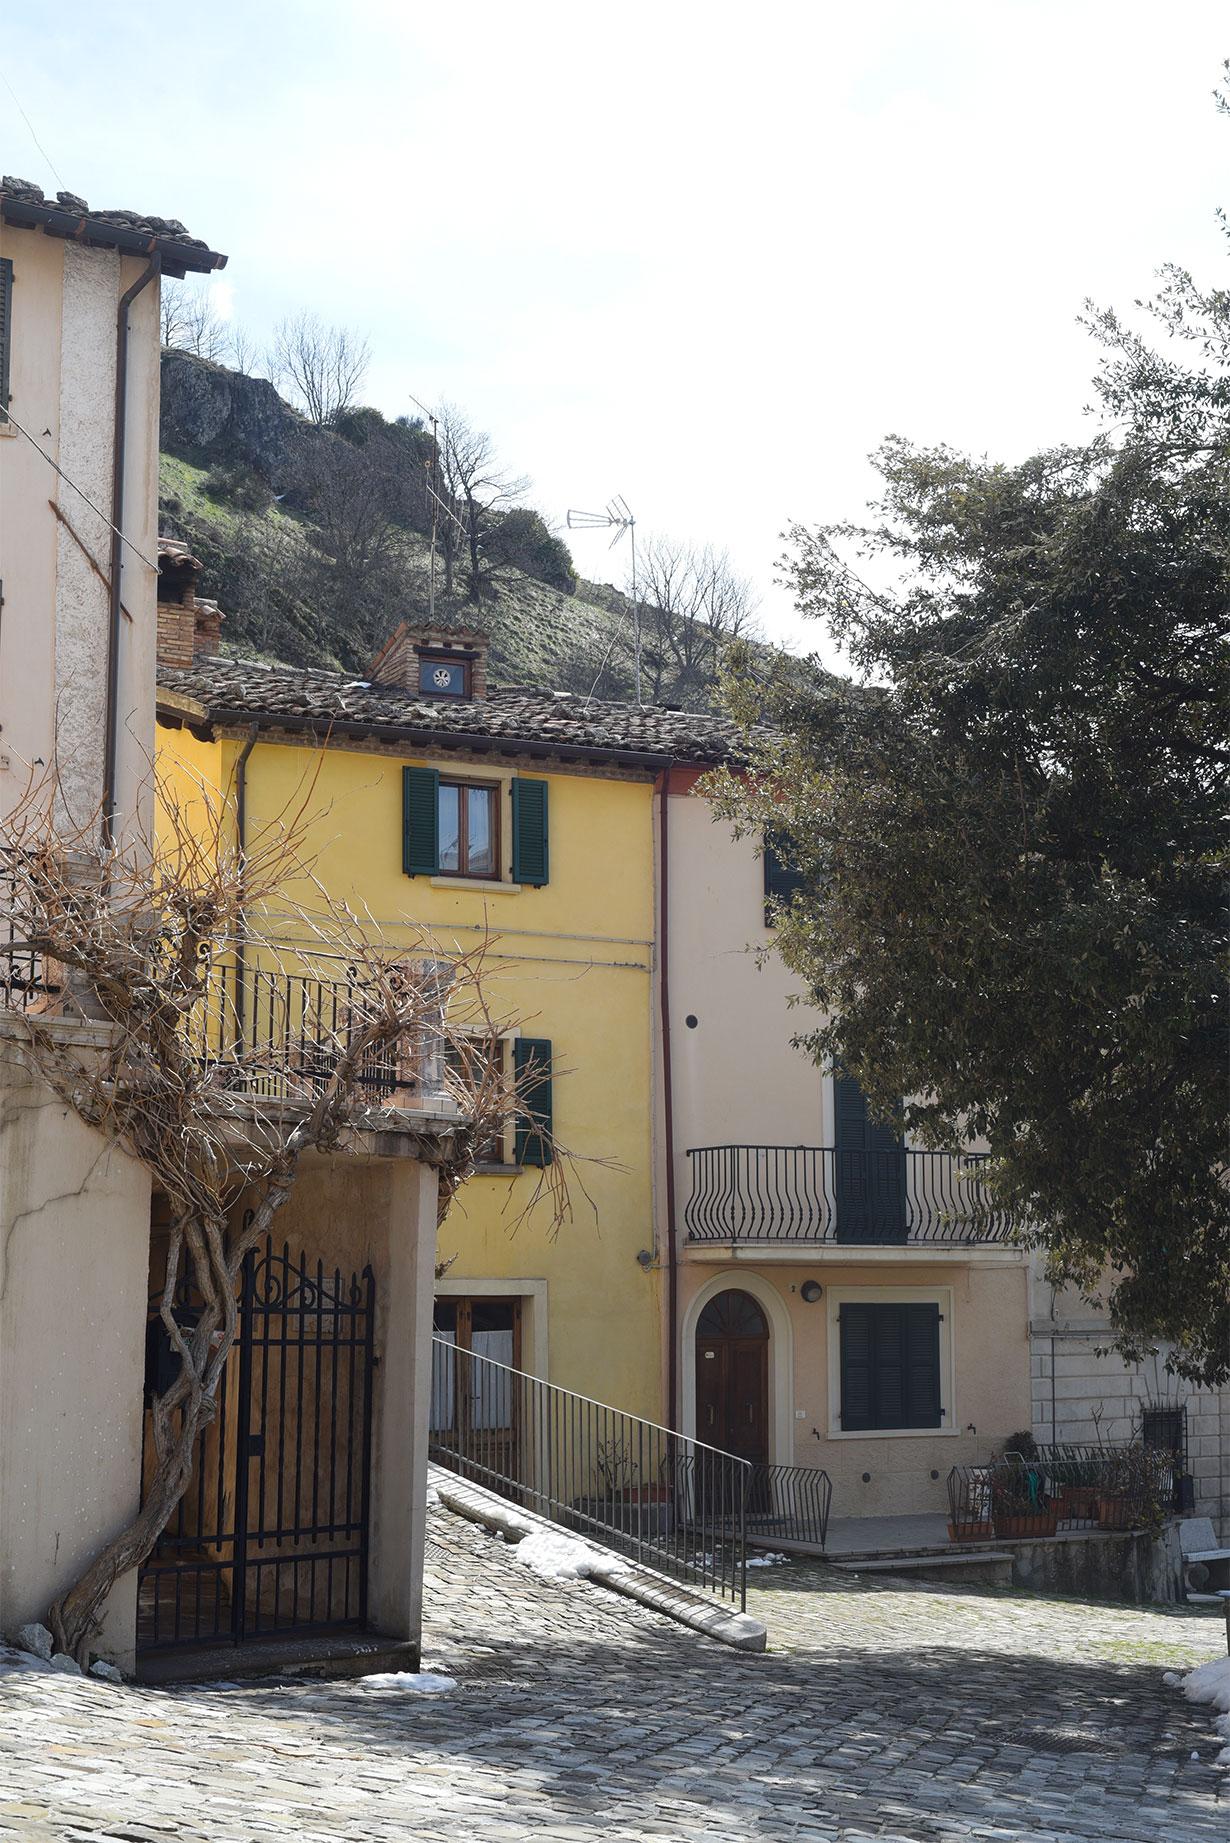 Pennabilli street